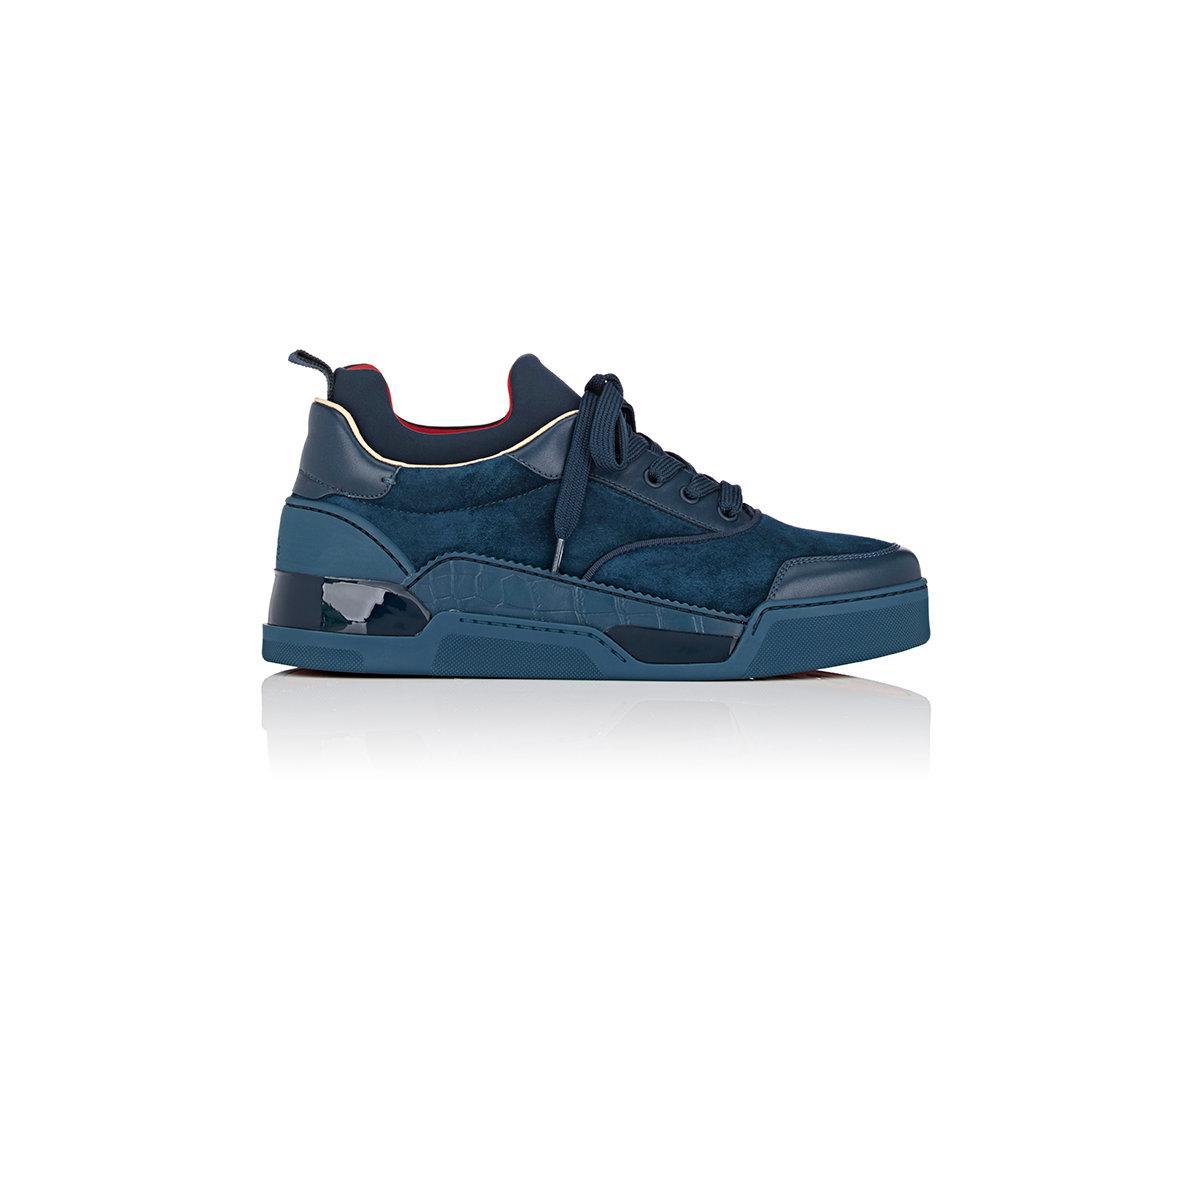 reputable site 923af 37067 Men's Blue Aurelien Flat Sneakers